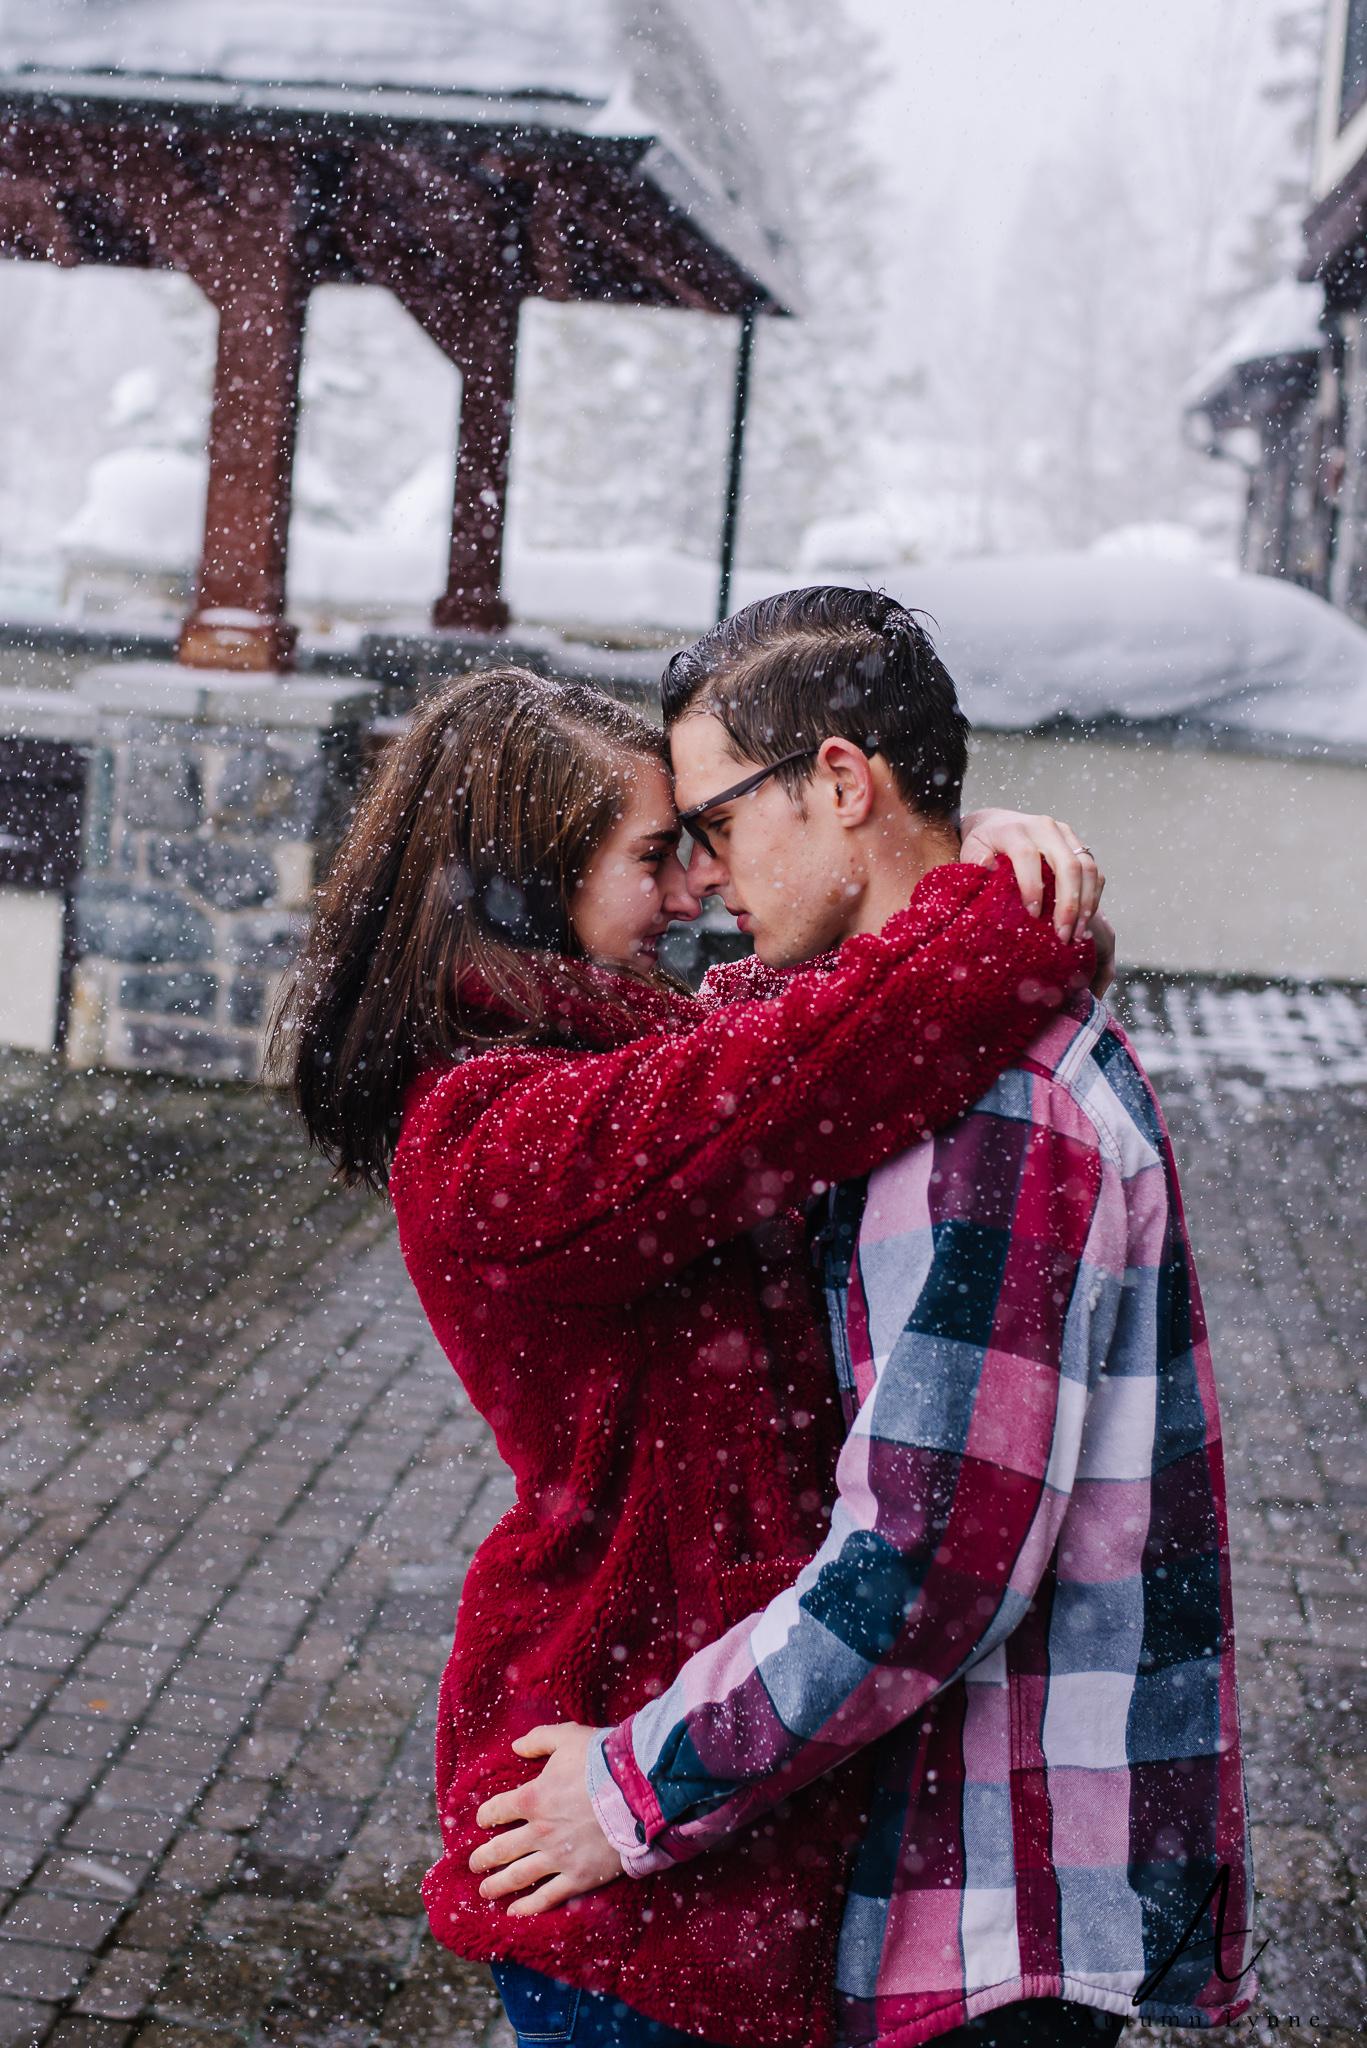 snowy-engagement-session-ideas-idaho-wedding-photographers